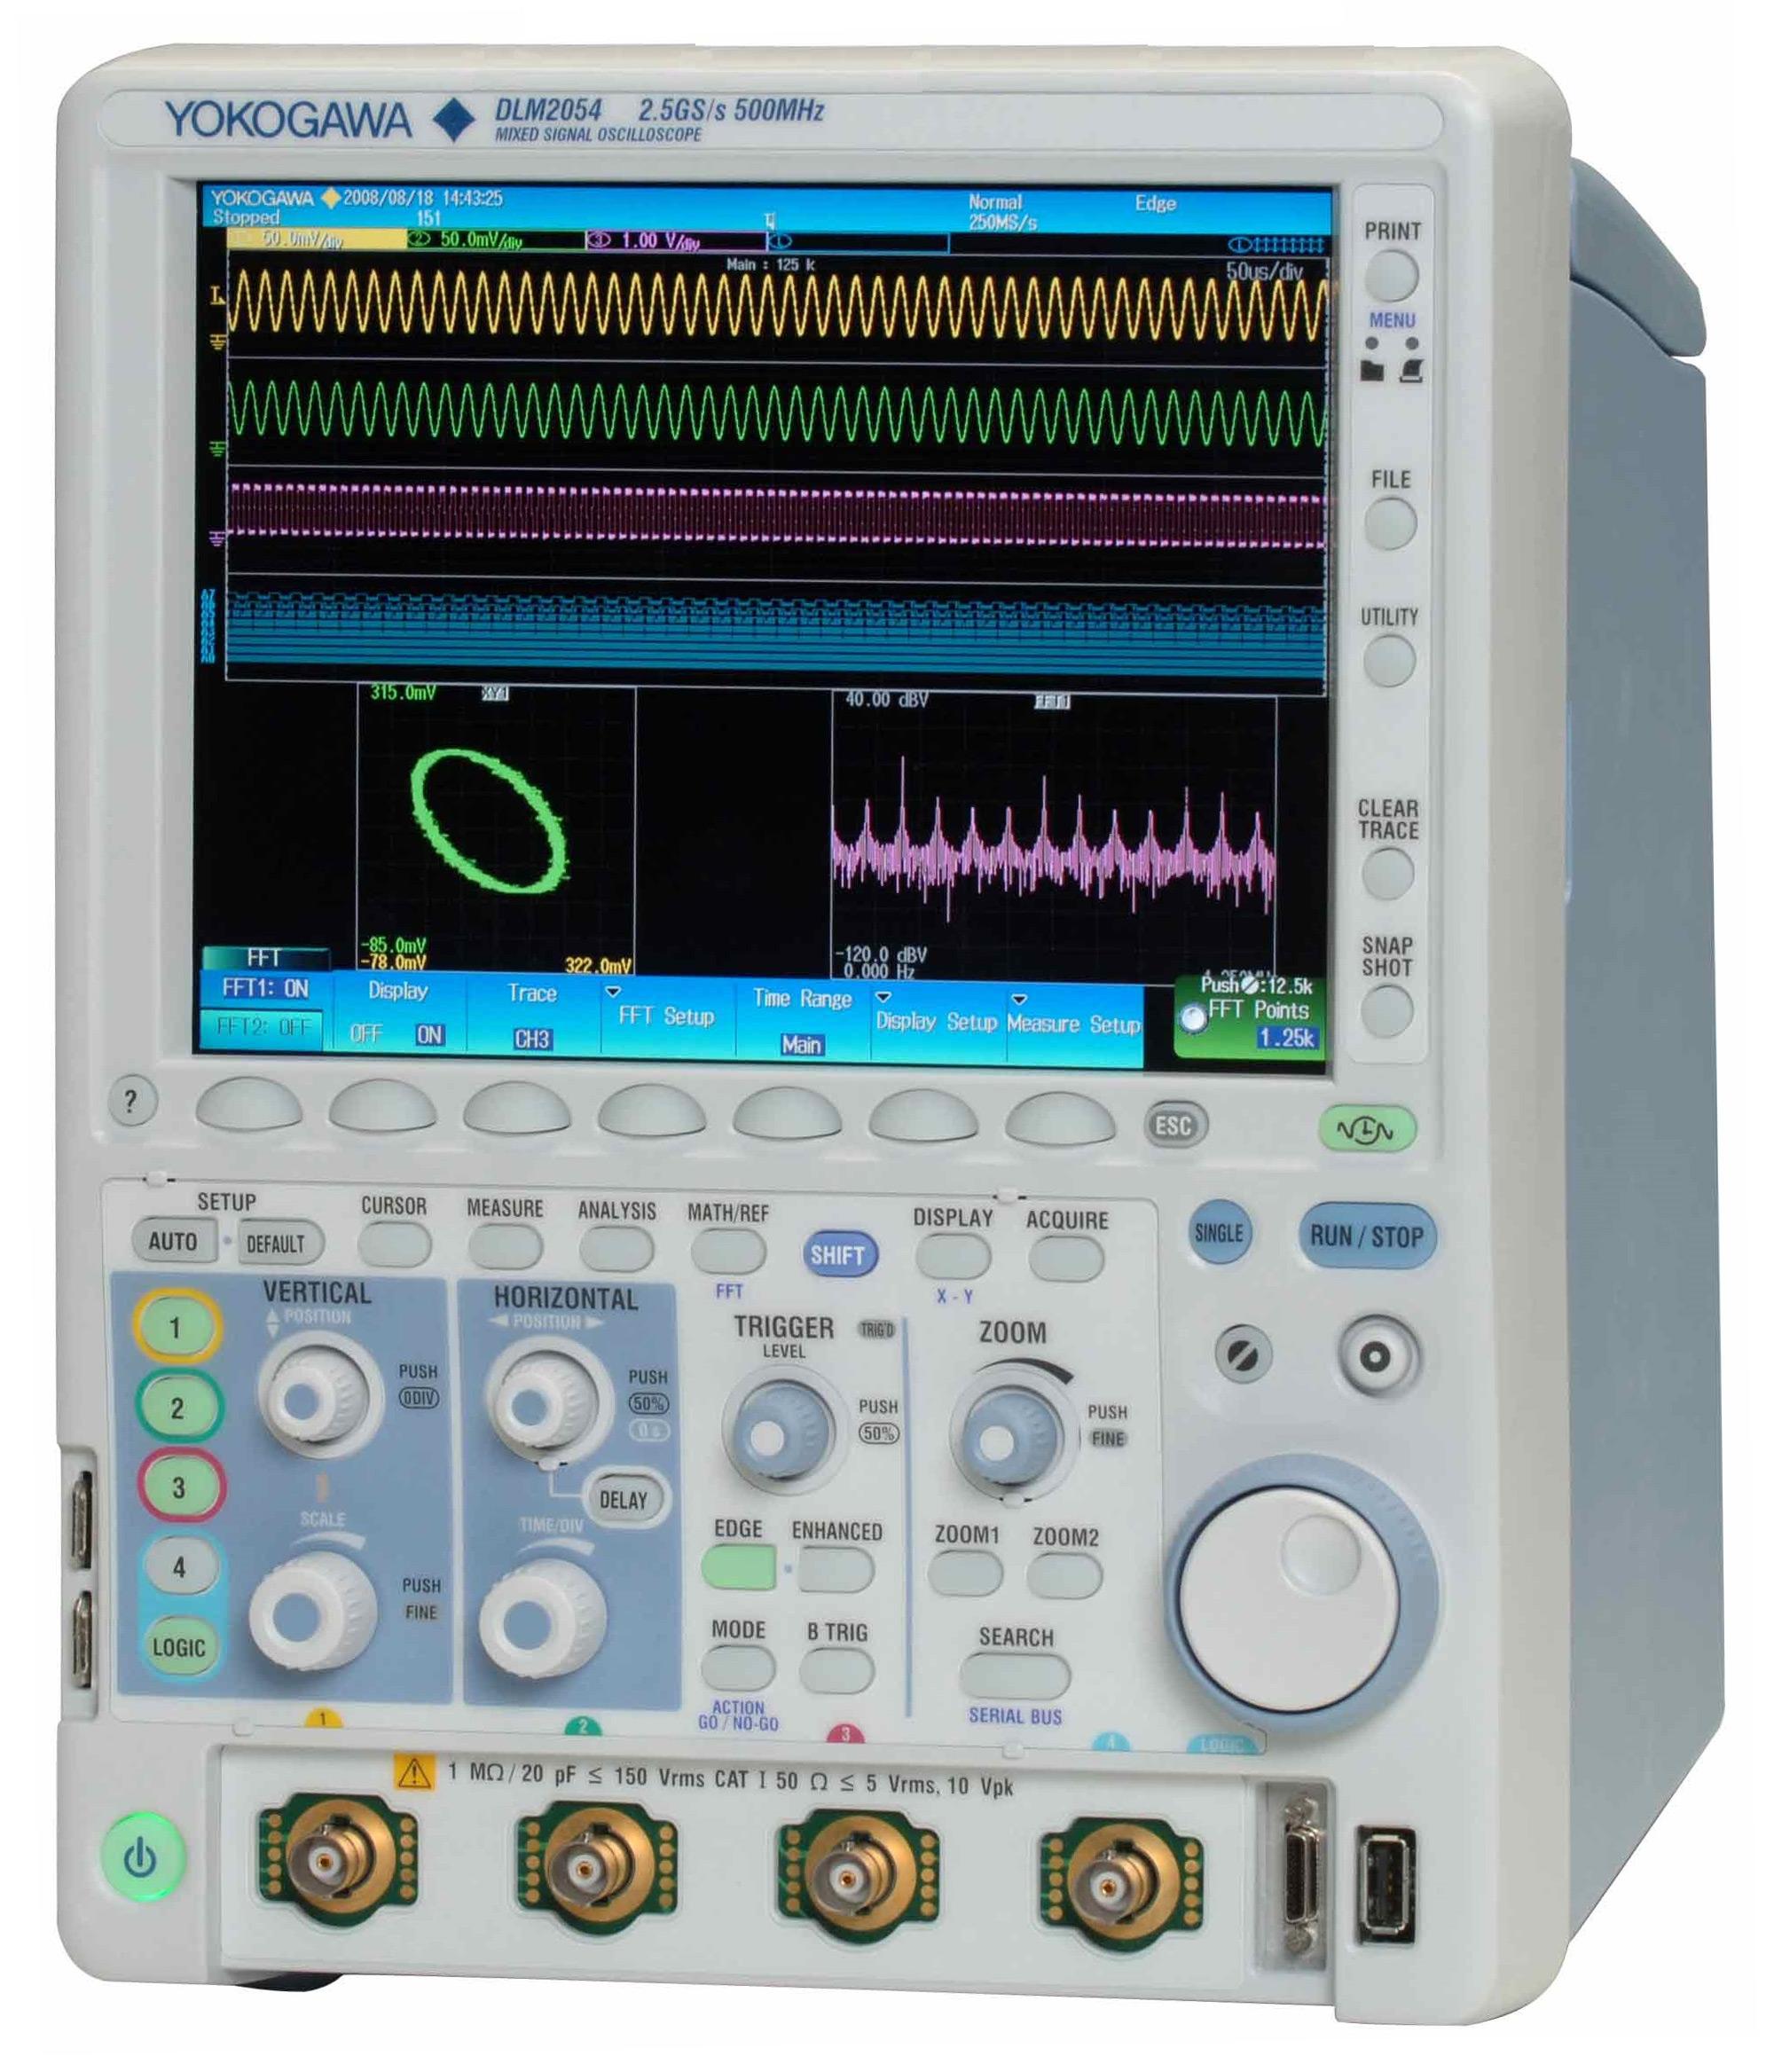 Yokogawa Test Equipment Rentals Atec 0 500mhz Pic16f876 Rf Power Meter Dlm 2054 500 Mhz 16 Ch Digital 4 Analog Oscilloscope